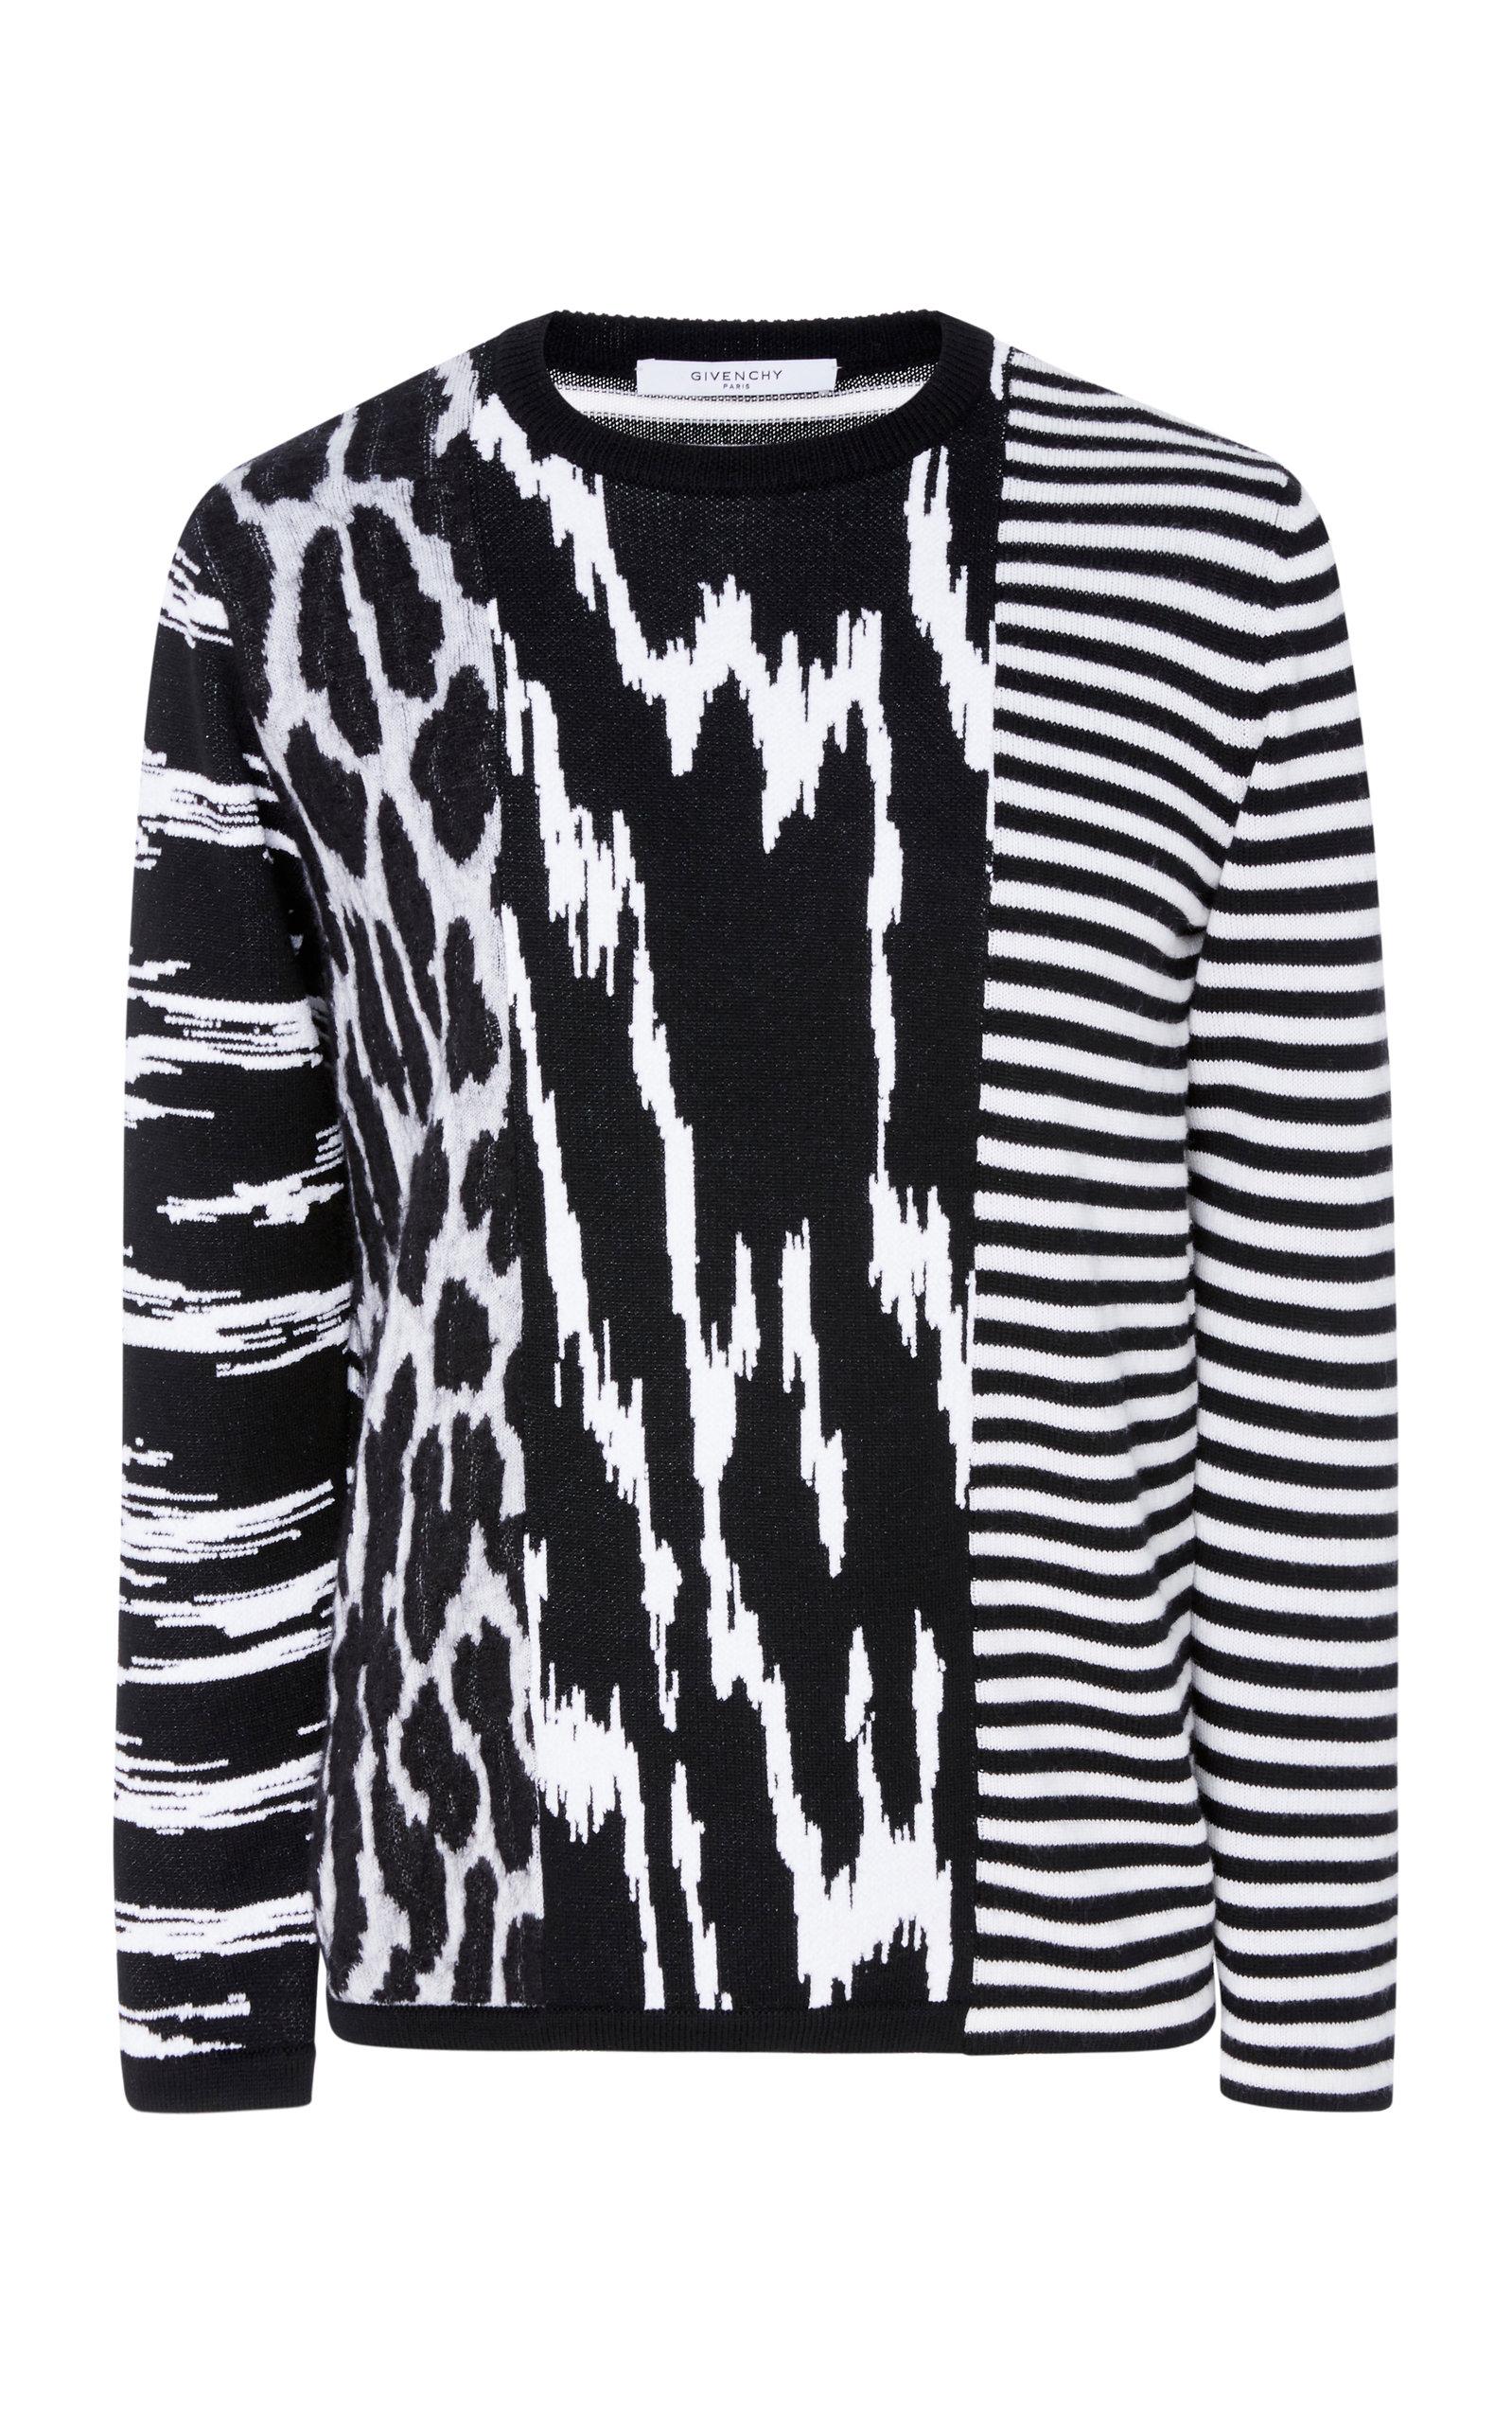 In Intarsia Animal Crewneck Givenchy Sweater Striped Wool Black